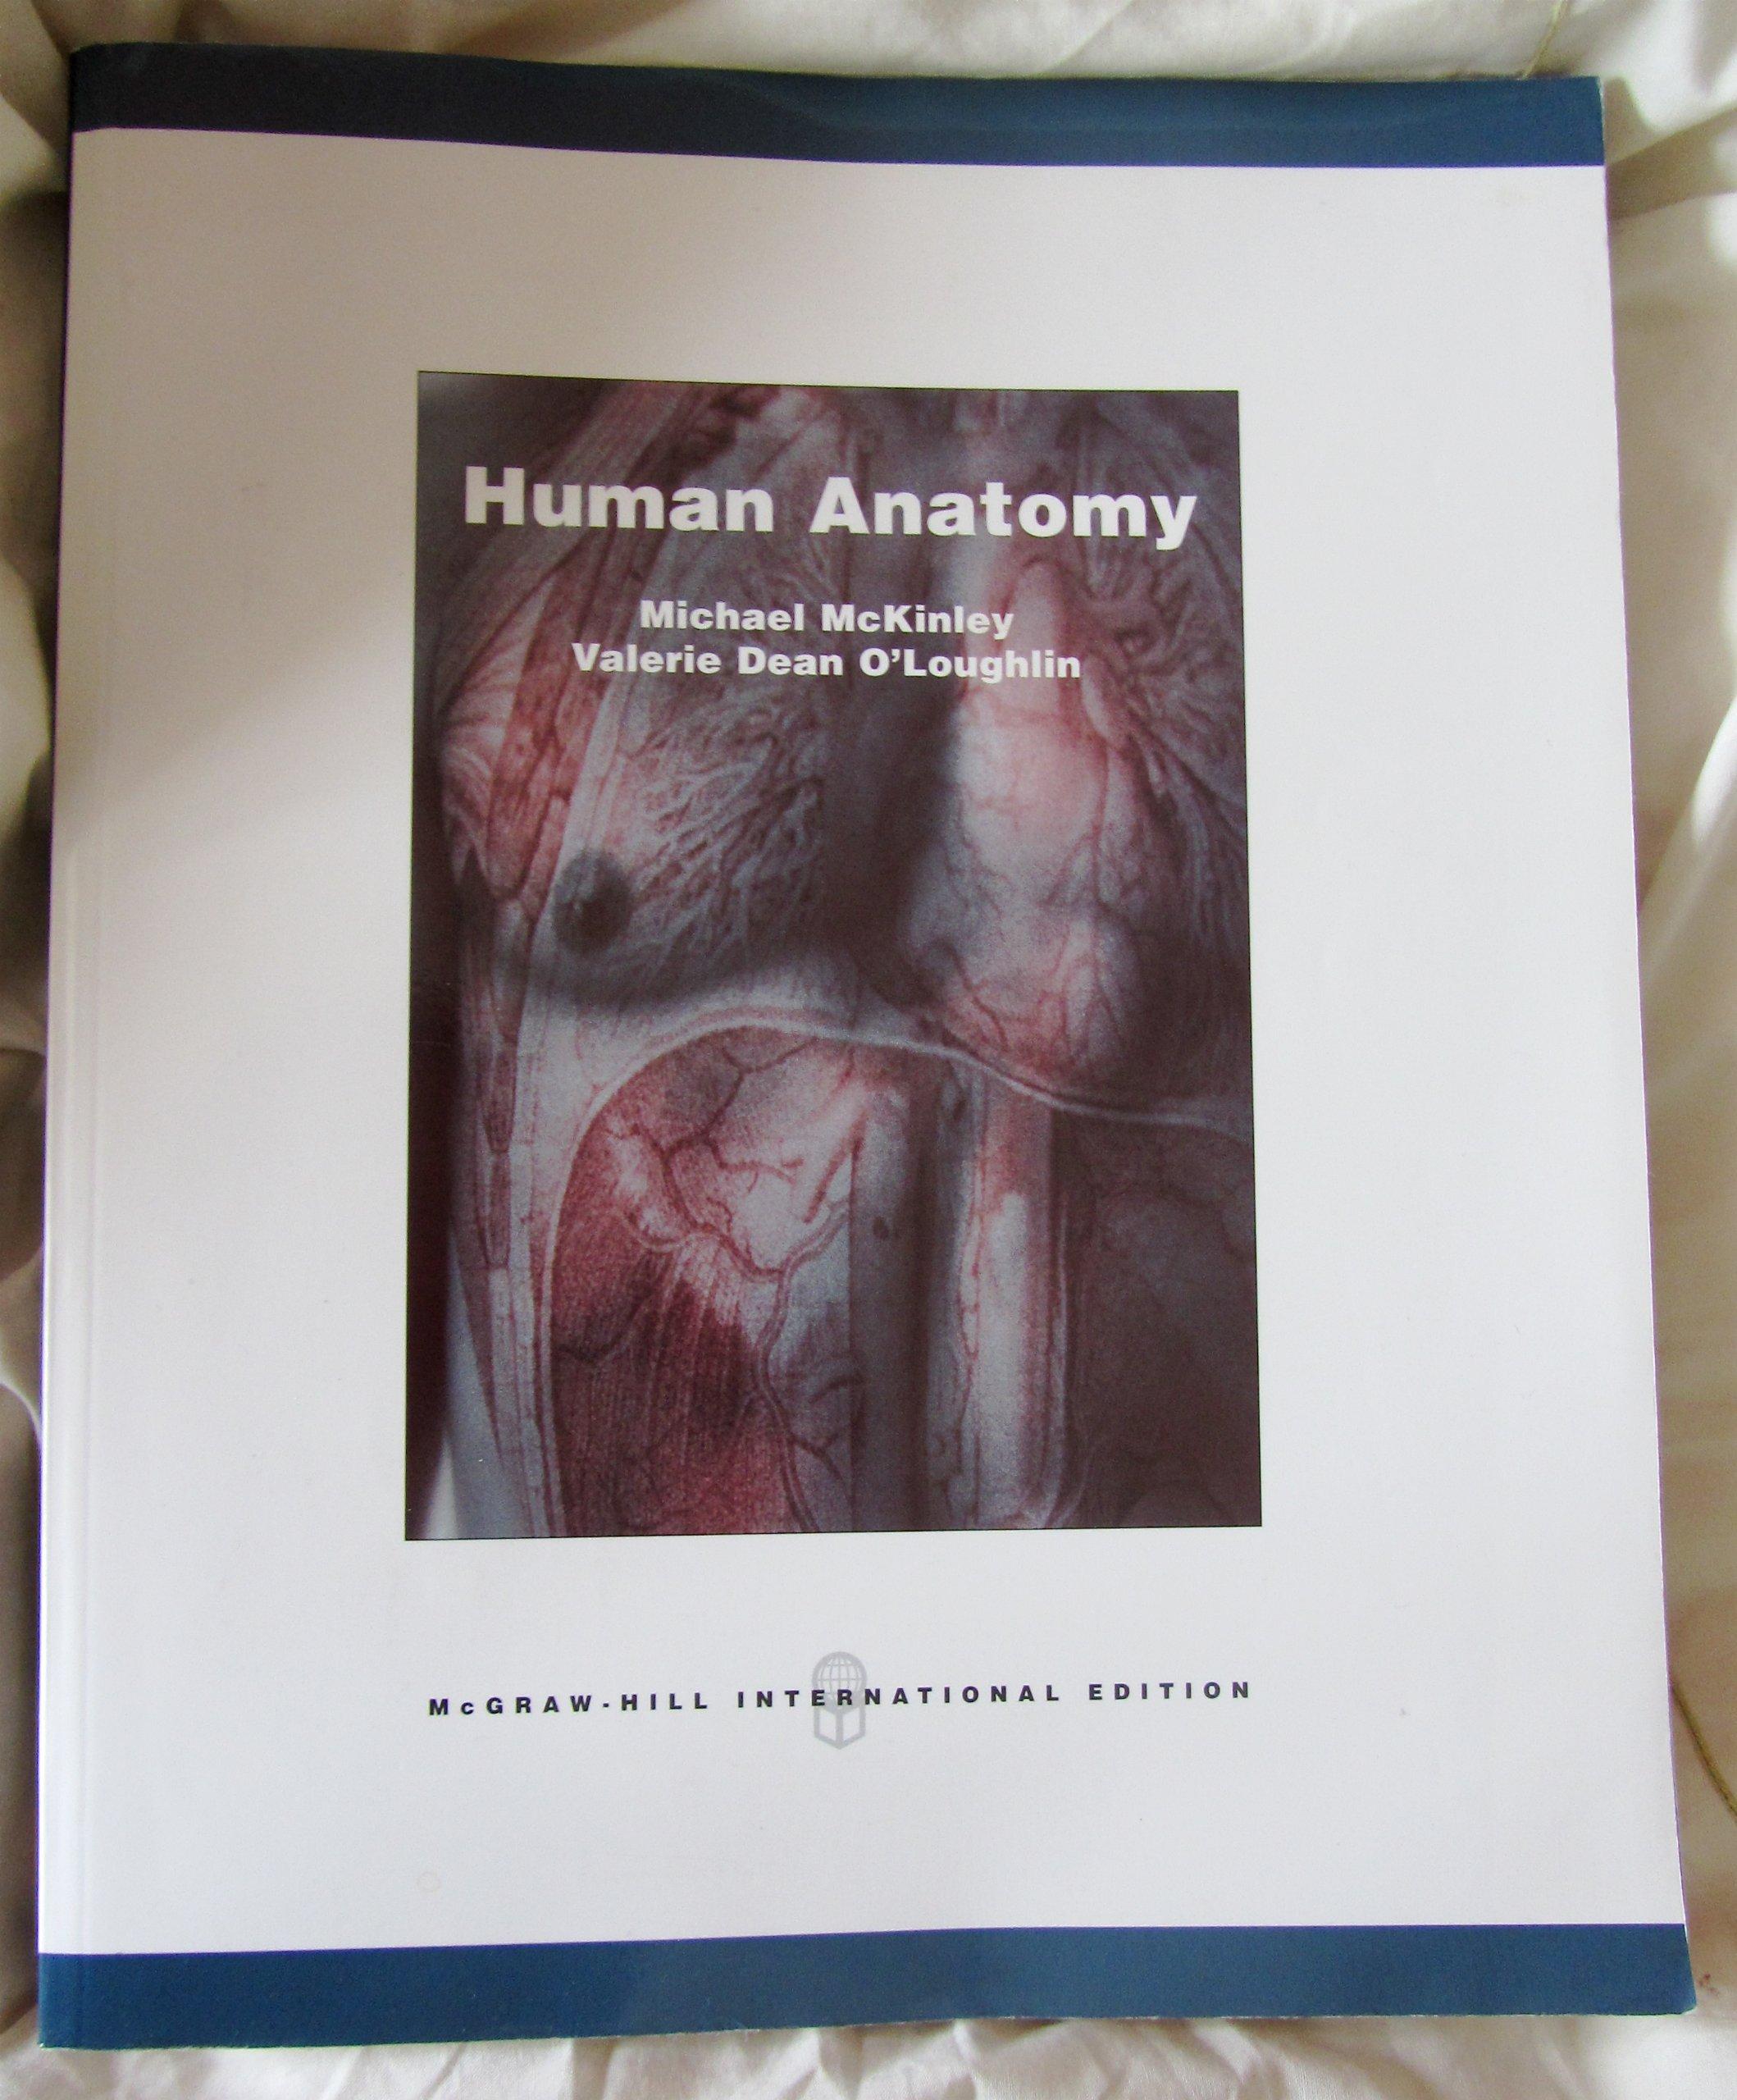 Human Anatomy Michael Mckinley And Valerie Dean Oloughlin Mcgraw